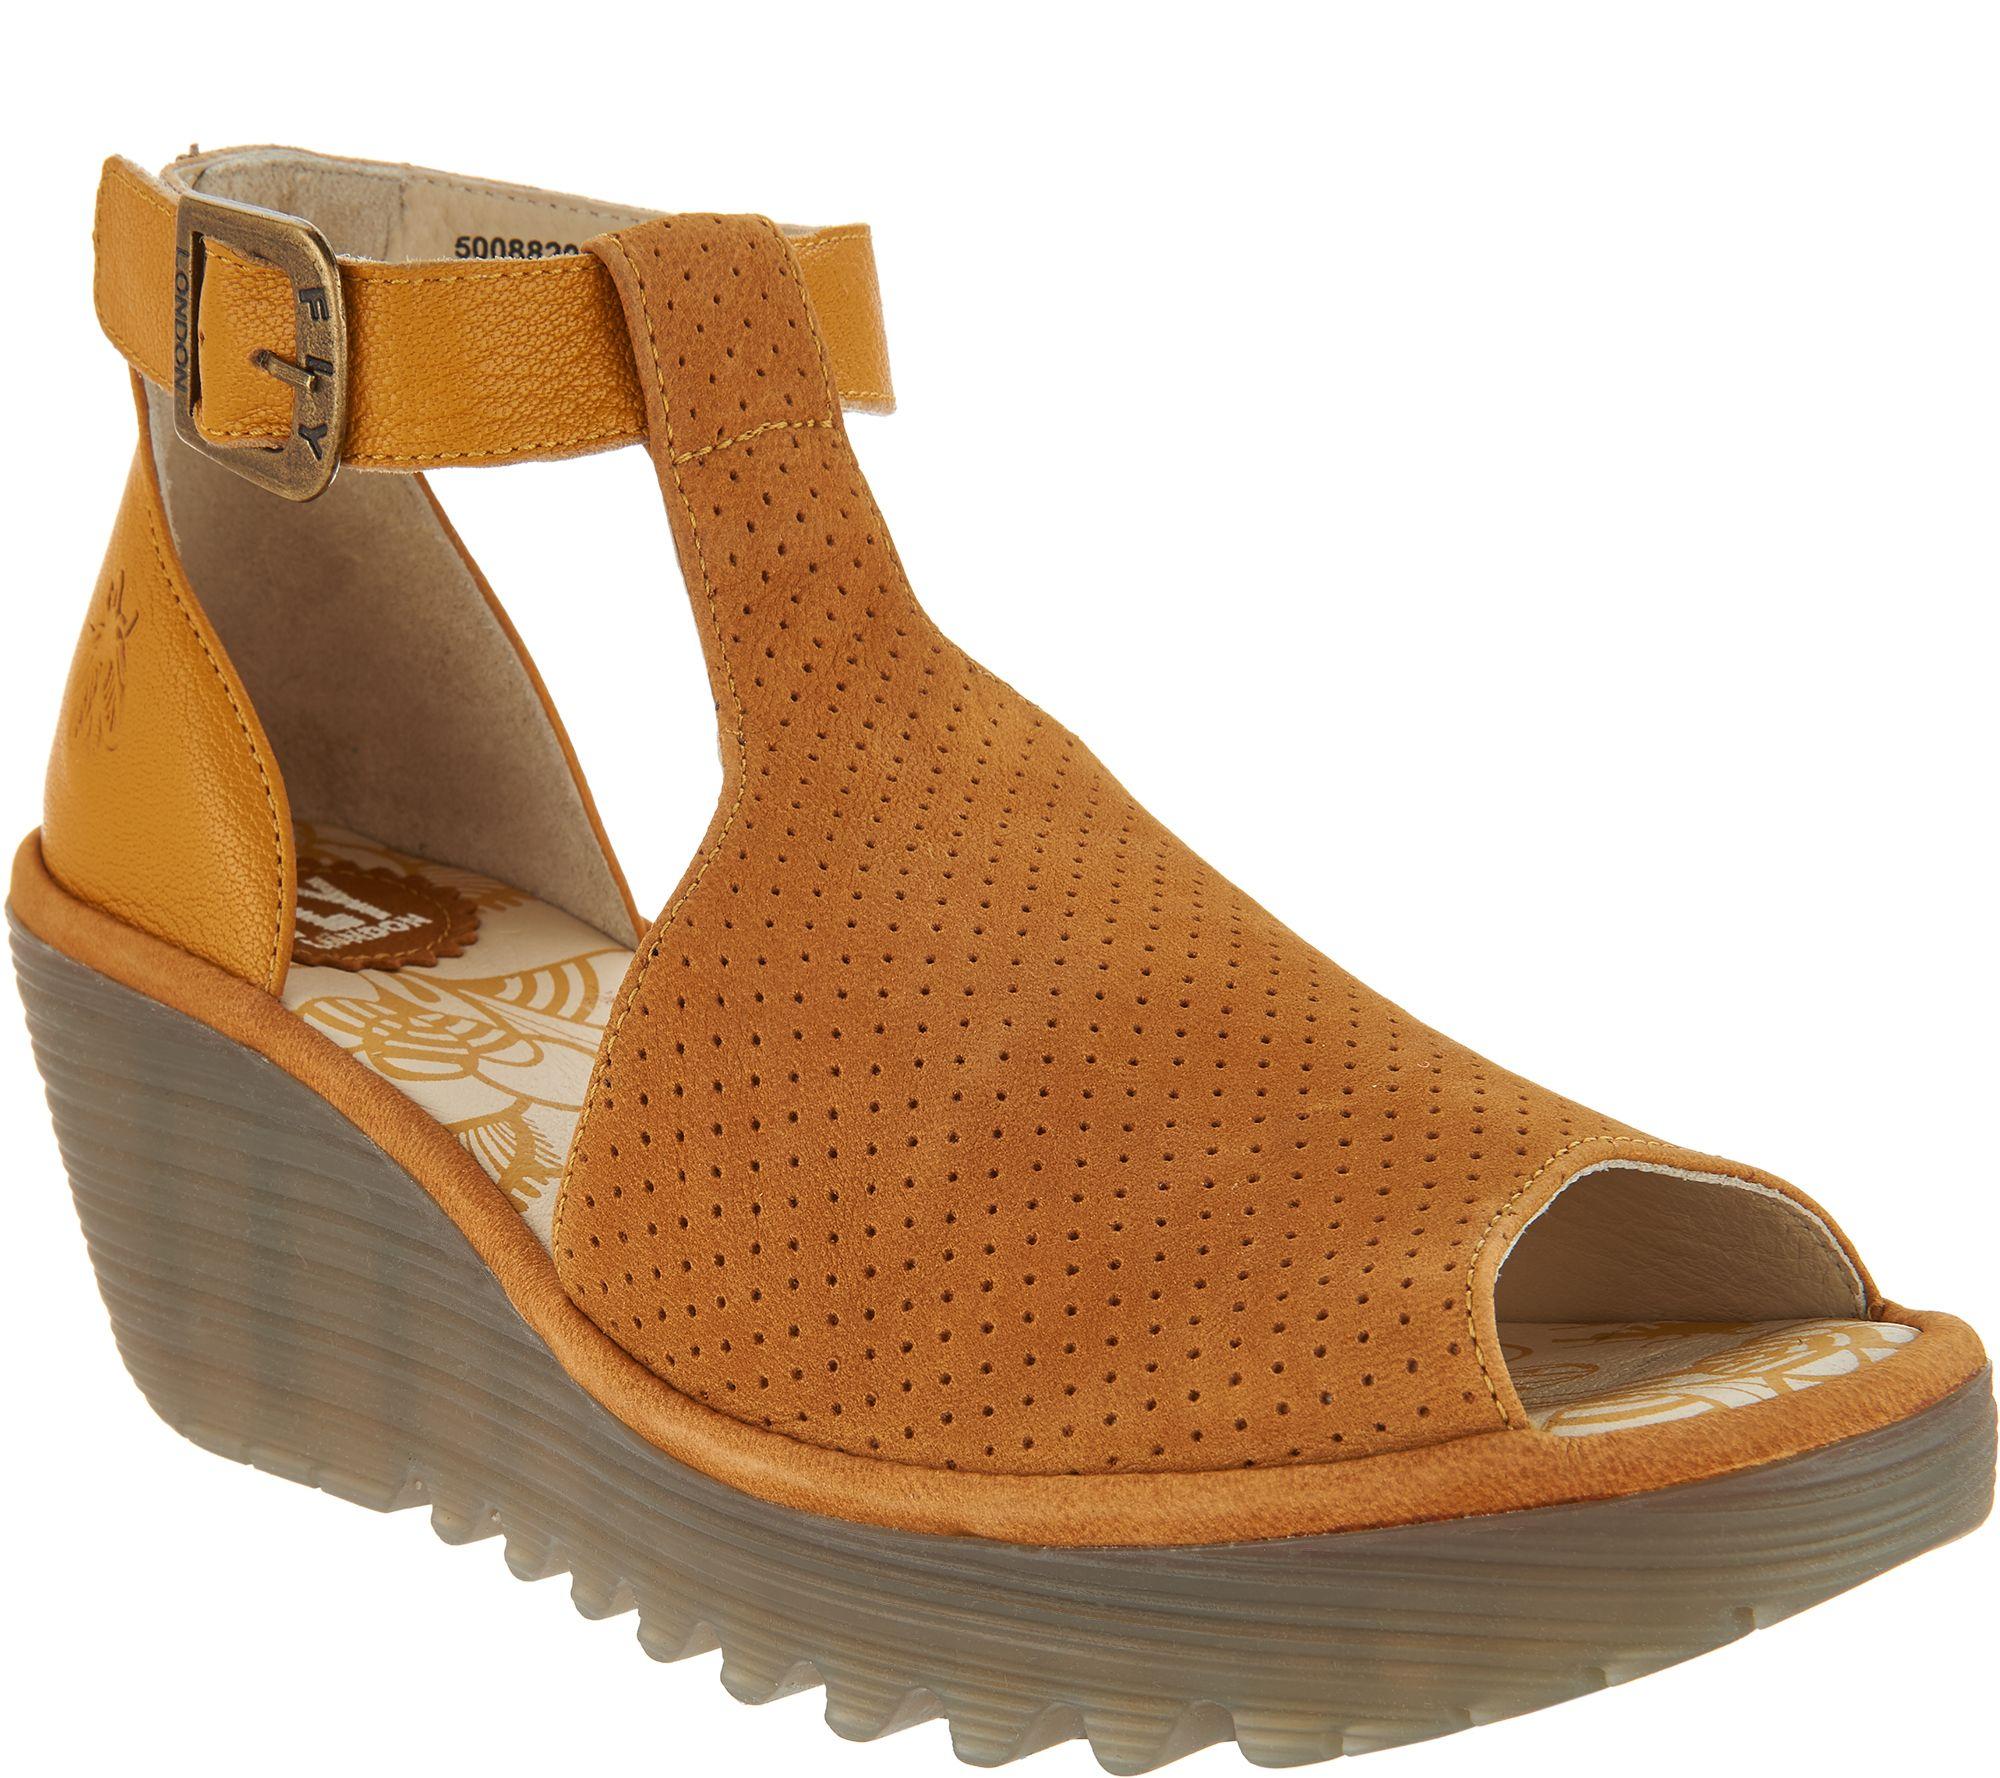 shoe black trance s dexflex comfort wedge wedges womens comfortable sandal most payless comforter women